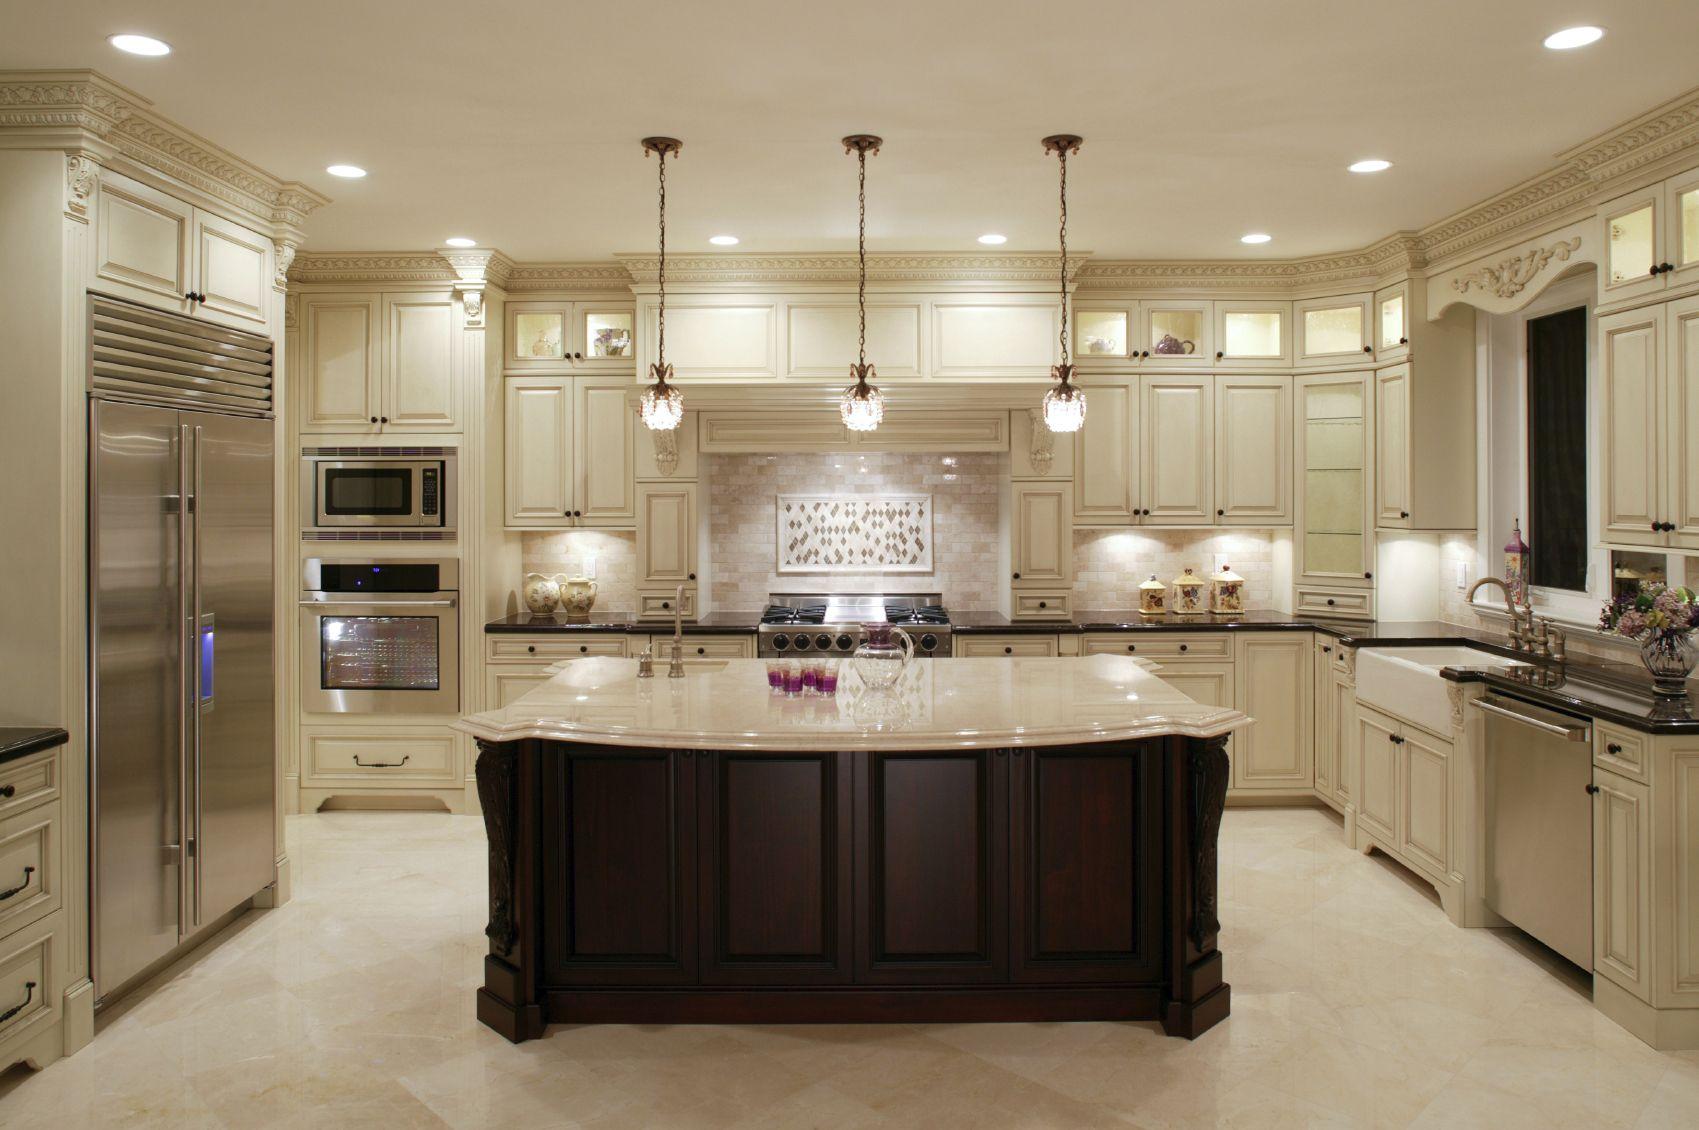 U-shaped luxurious large kitchen with pendant lights